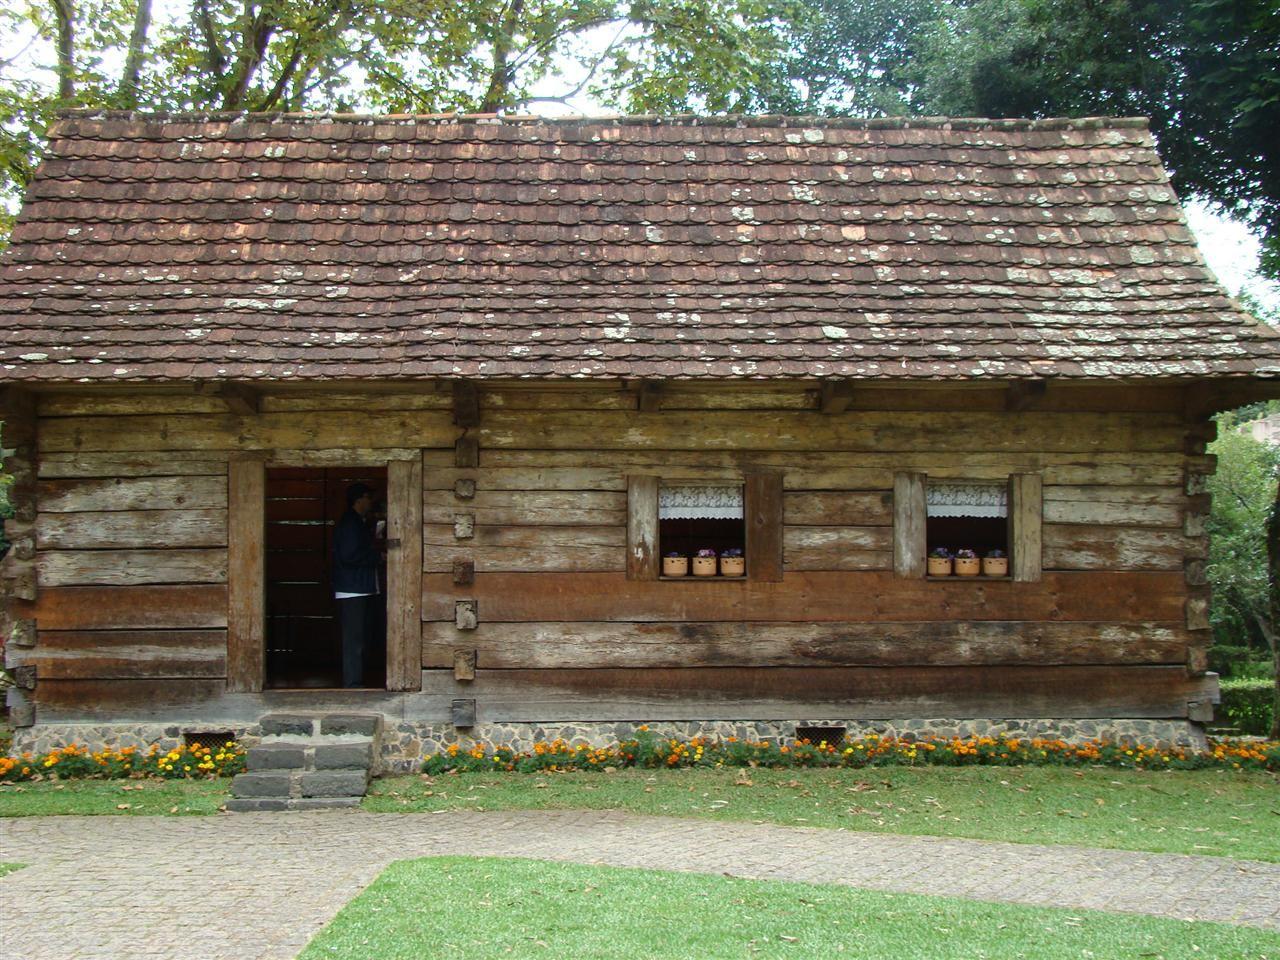 Casas de campo rusticas casas de campo pinterest for Modelos de casas rusticas